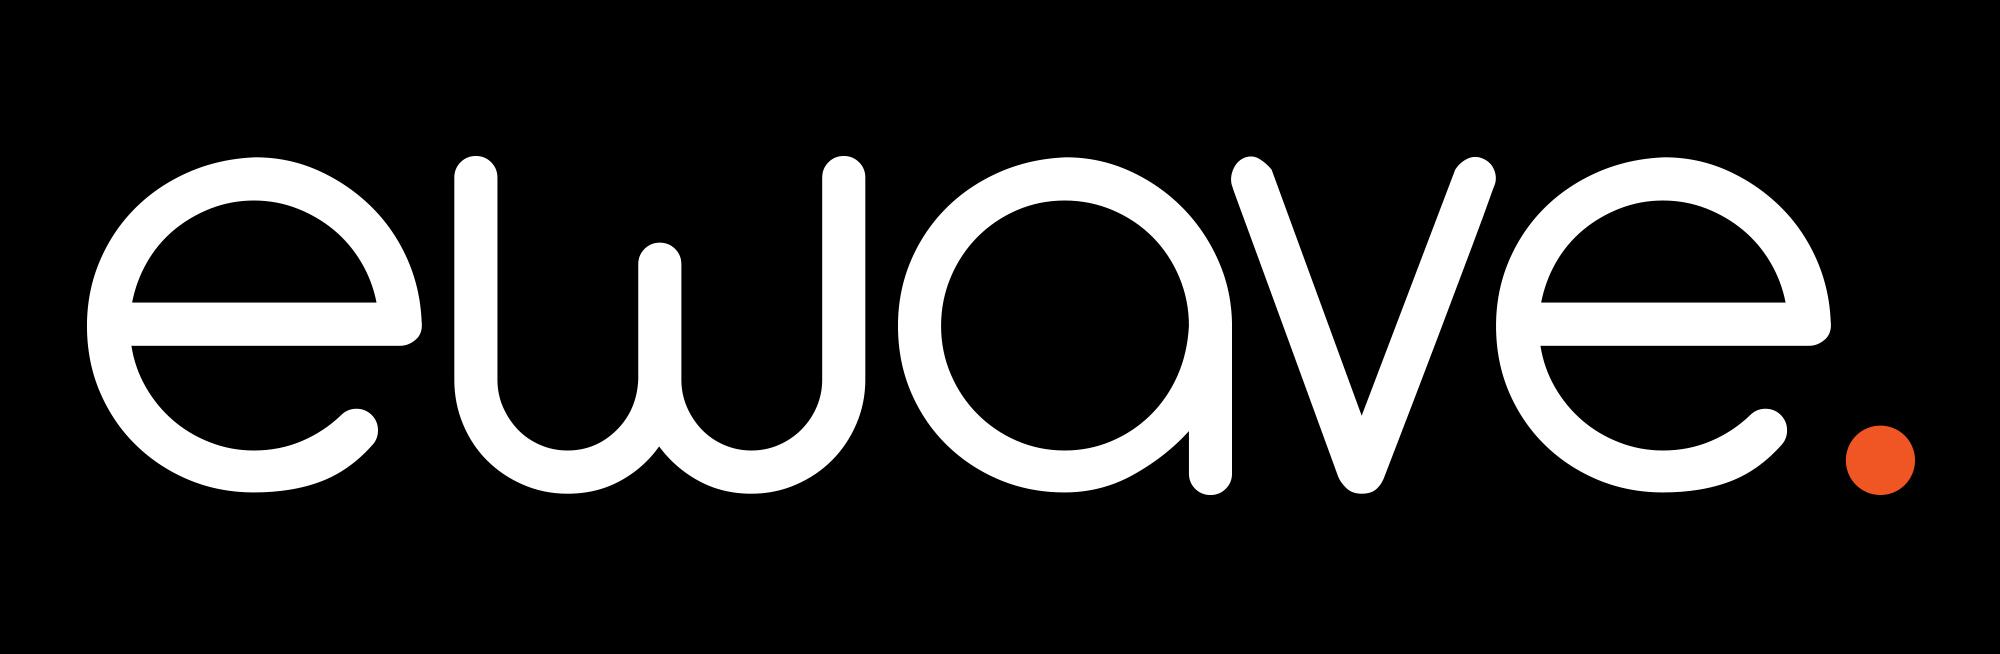 eWave_Logo_2000x654